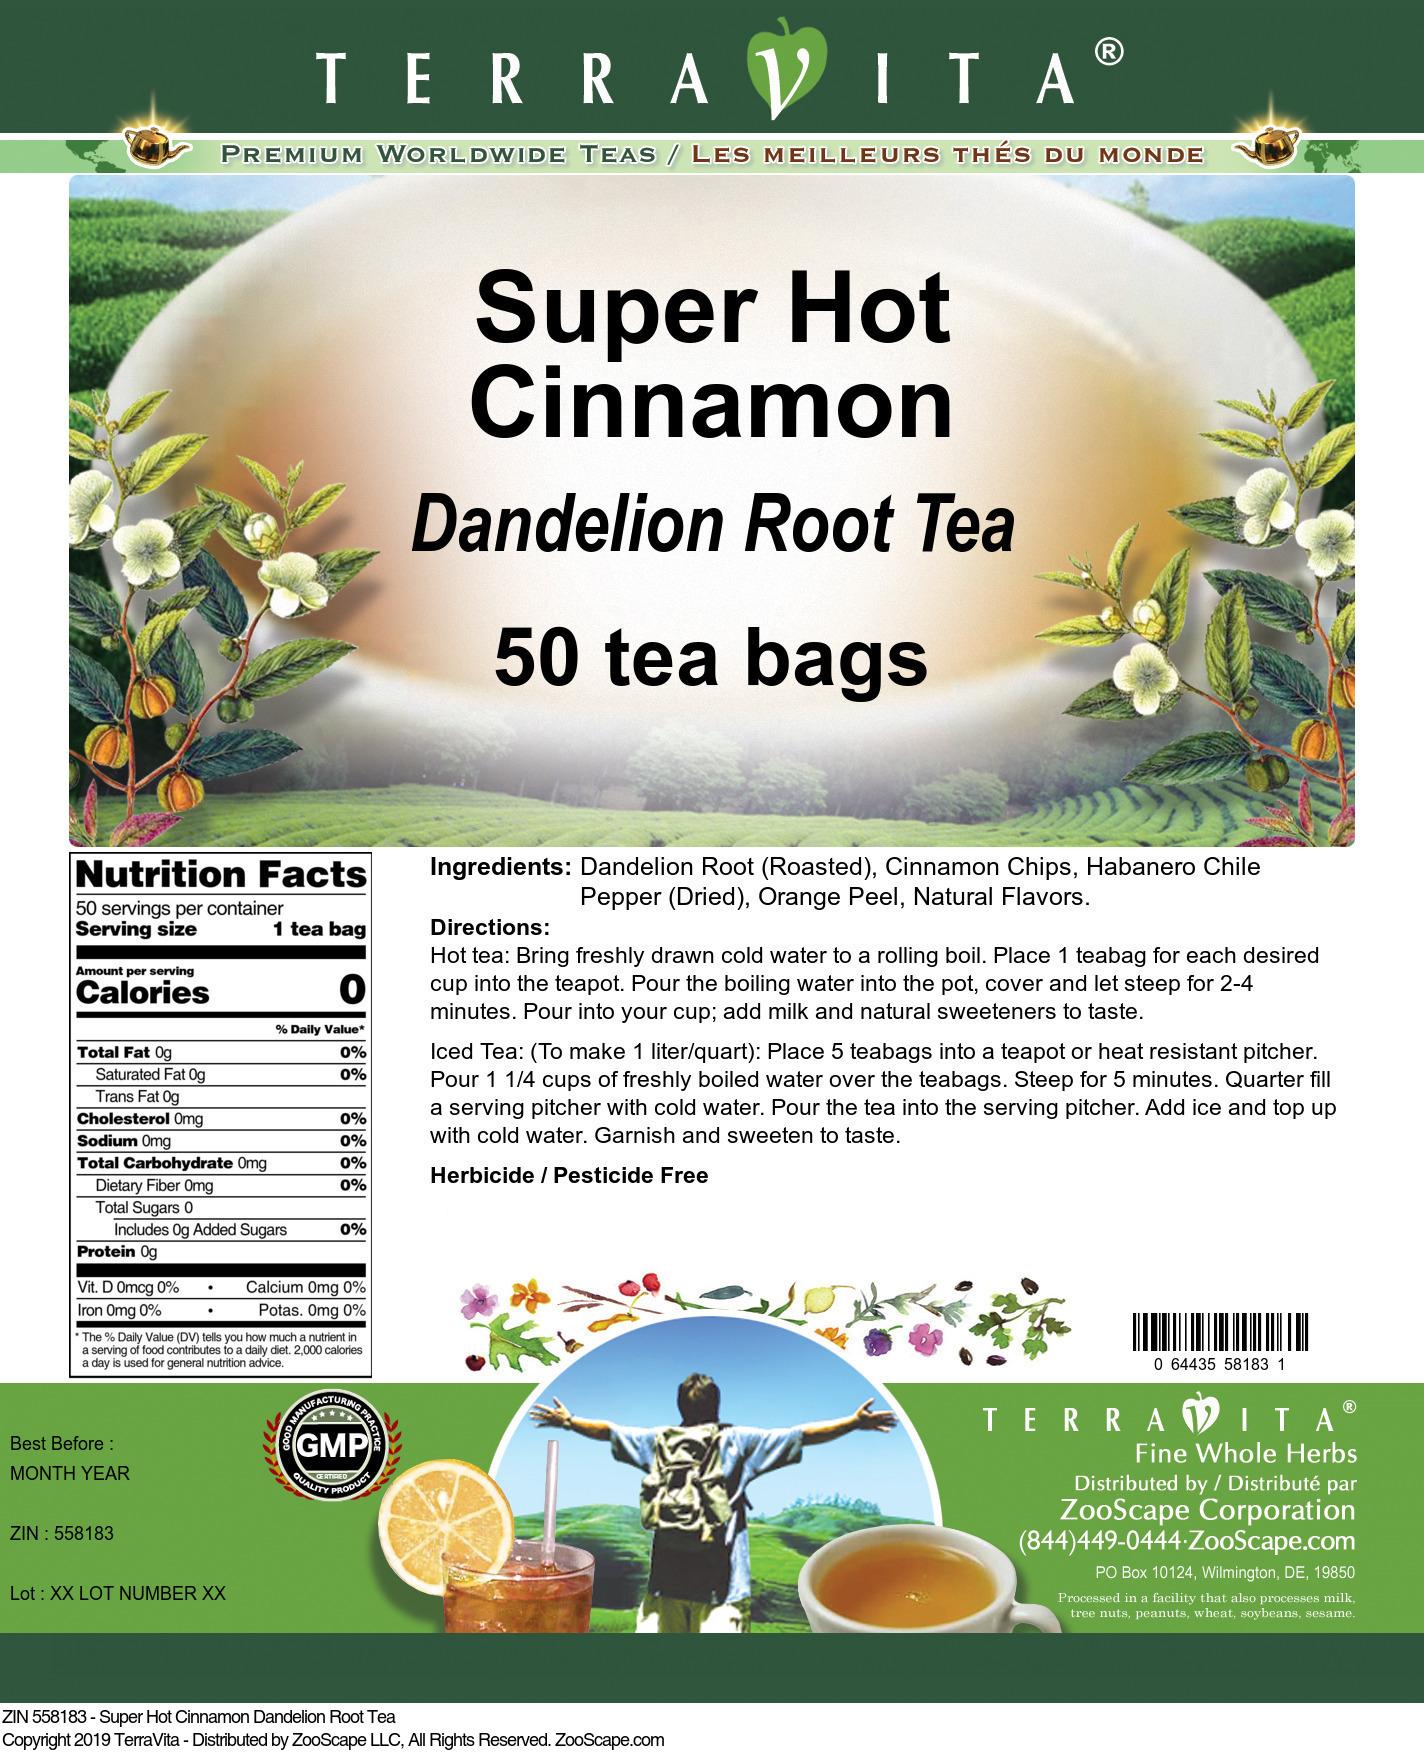 Super Hot Cinnamon Dandelion Root